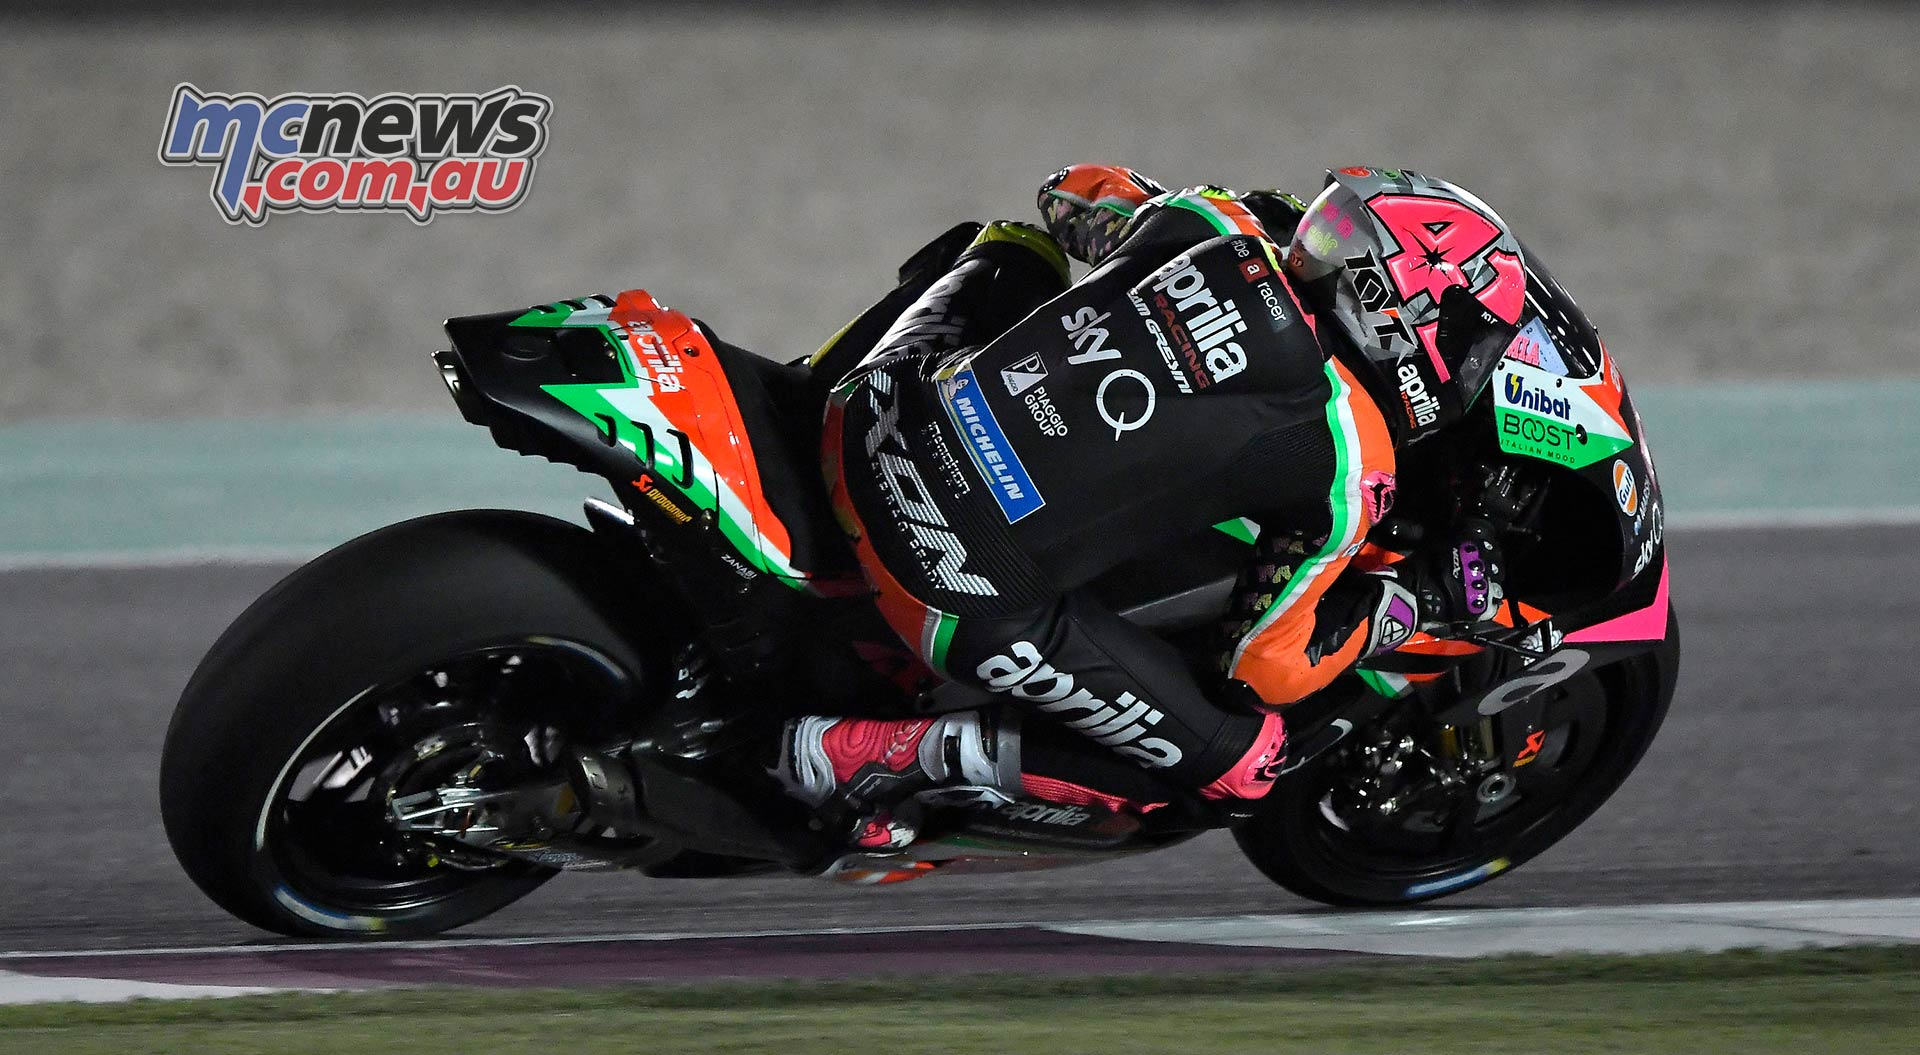 MotoGP Rnd Qatar Friday Aleix Espargaro